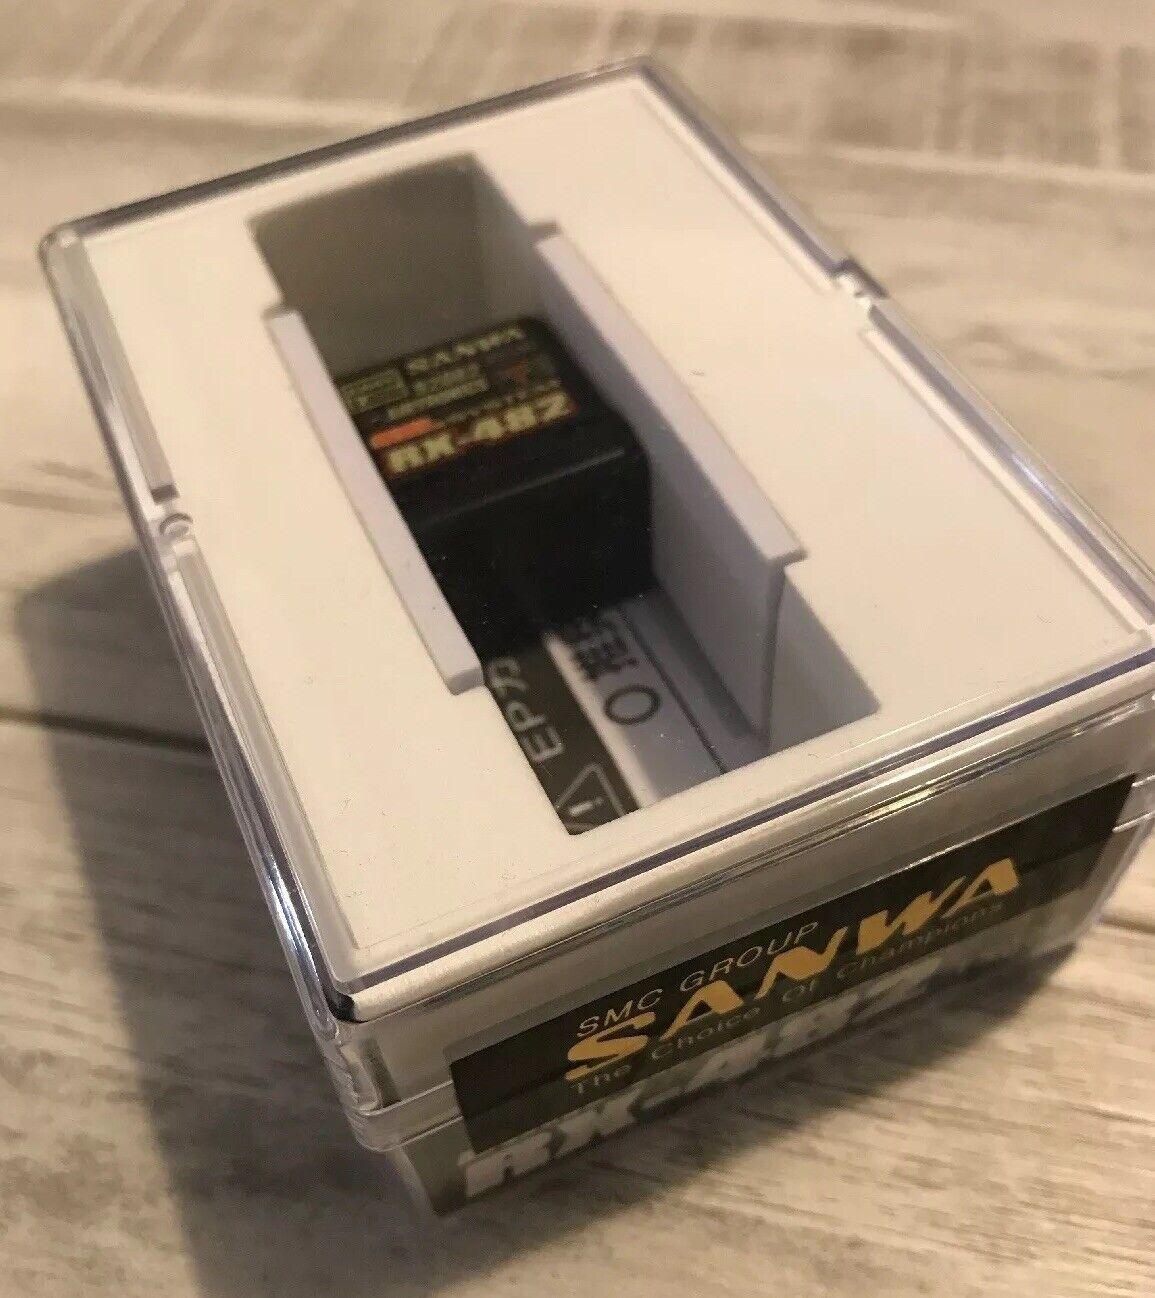 vendita online Sanwa     Airtronics Receiver  RX-482 2.4GHz 4-Channel FHSS-4 SSL Telemetry  stile classico